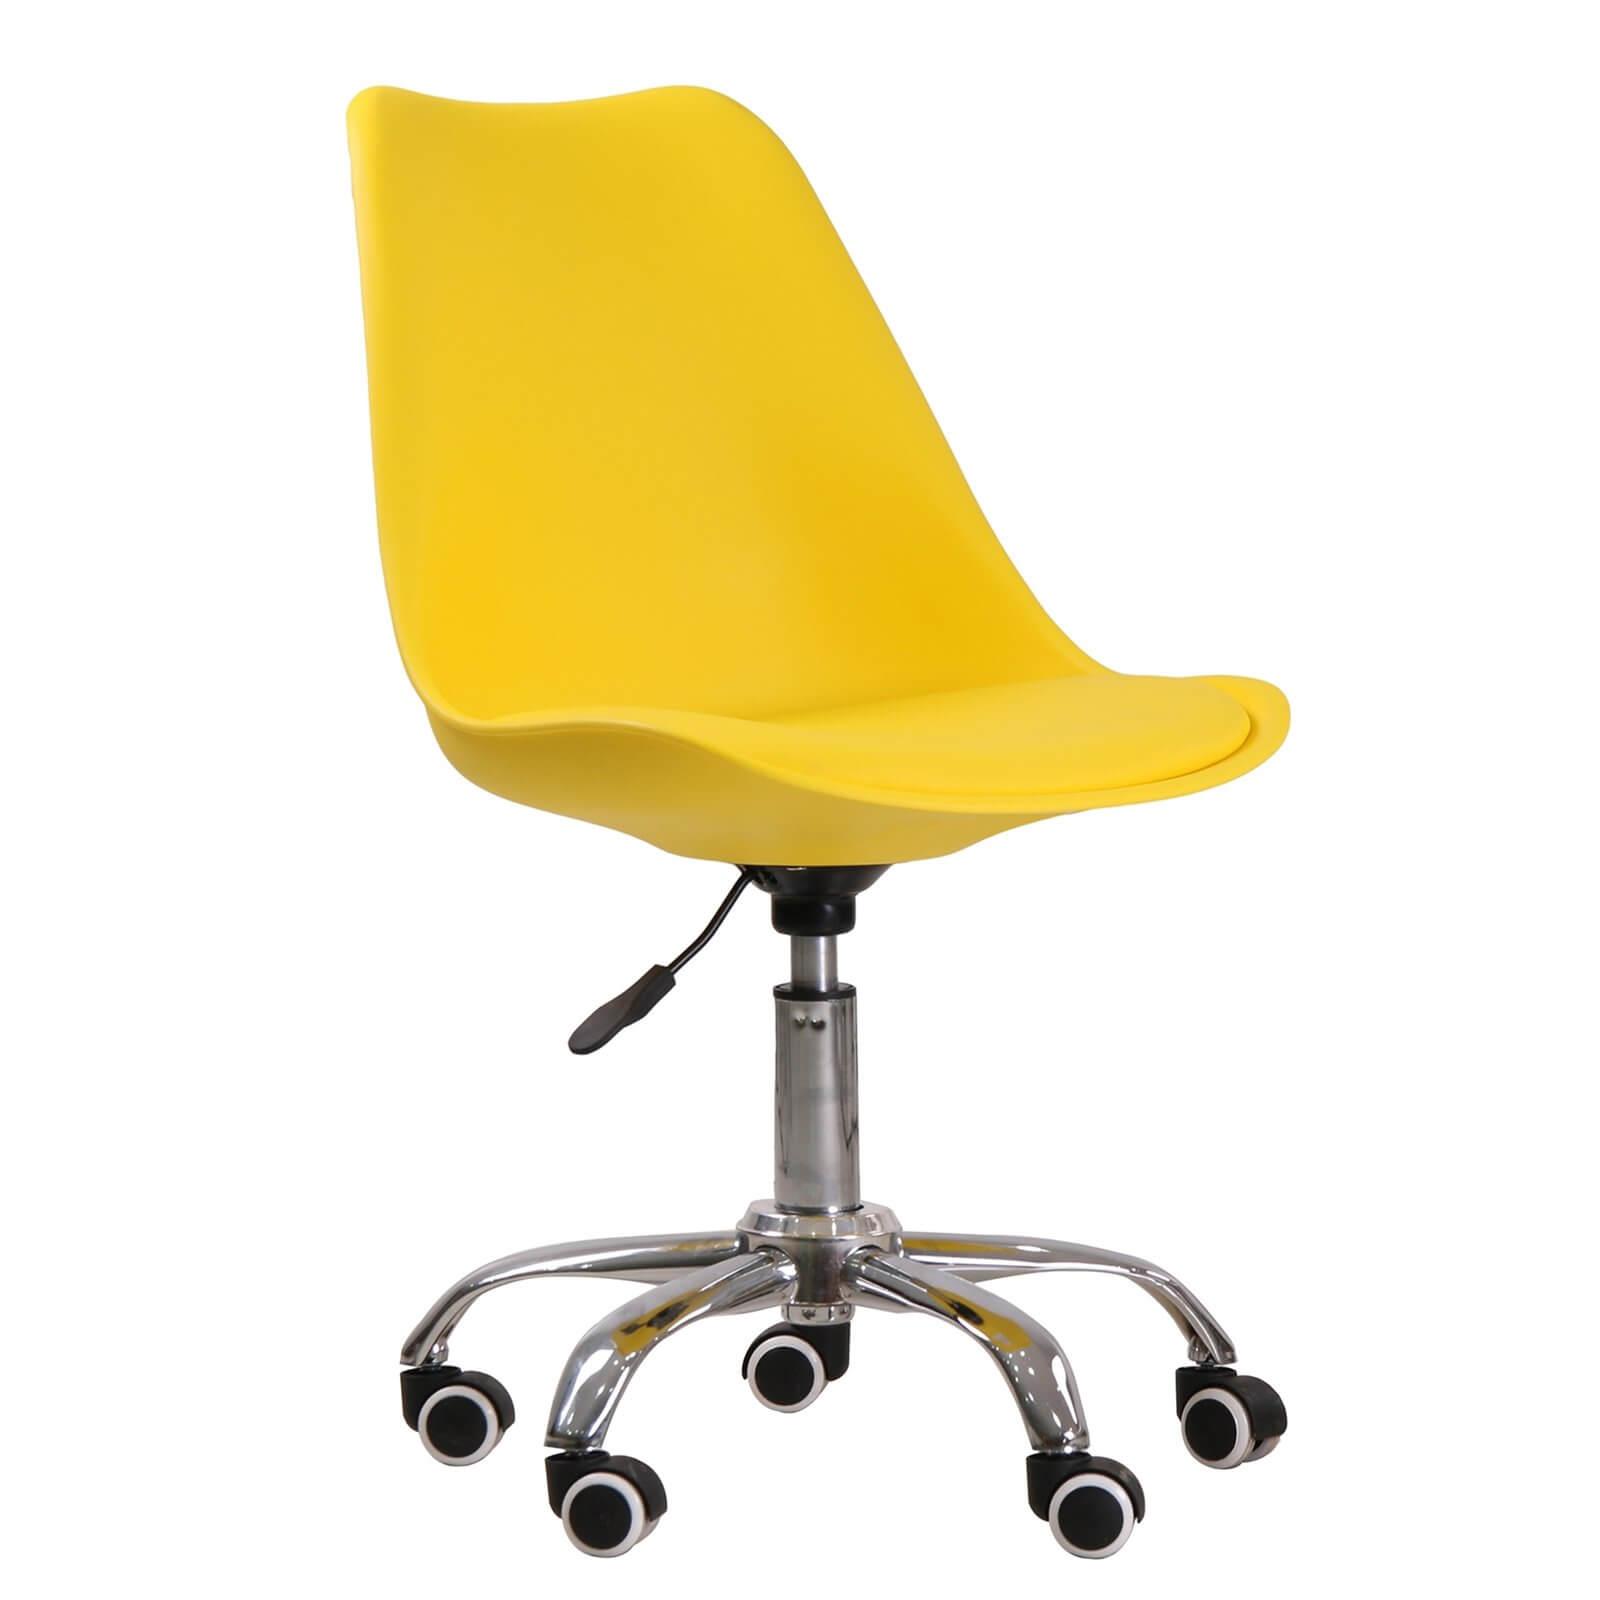 Orsen Swivel Office Chair - Yellow